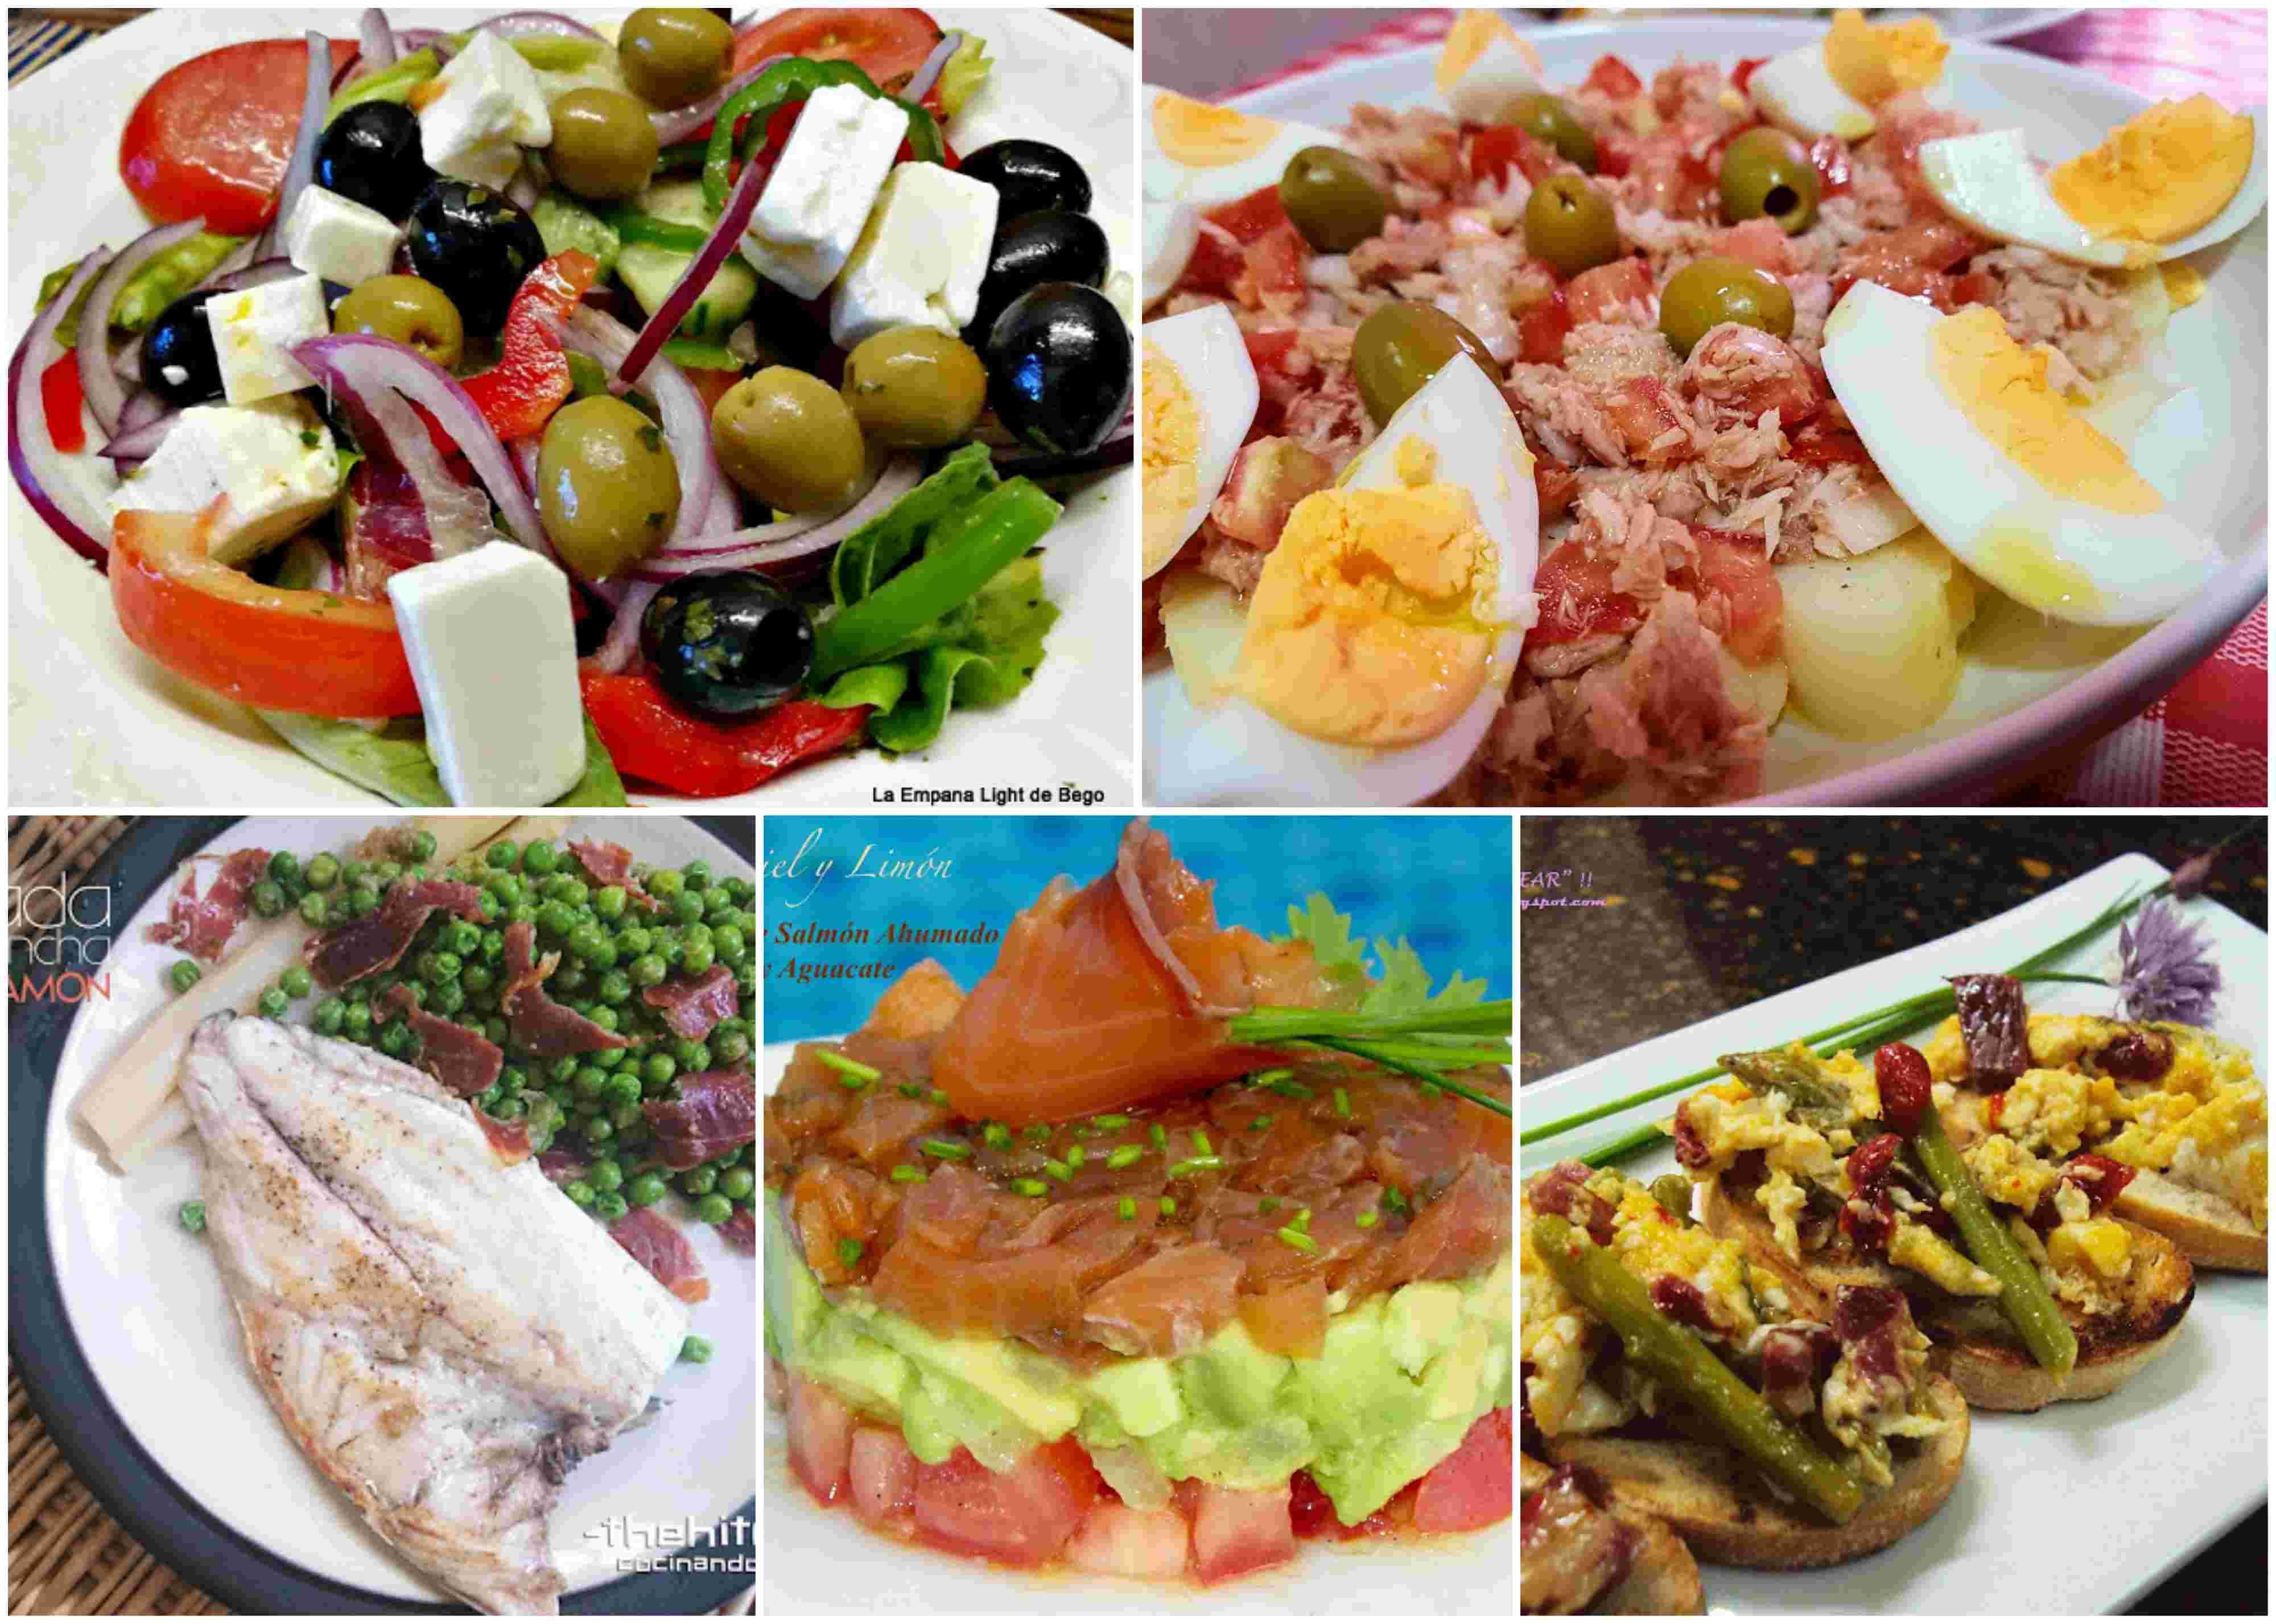 catering familiar para quince personas recetas de verano para cenas ligeras